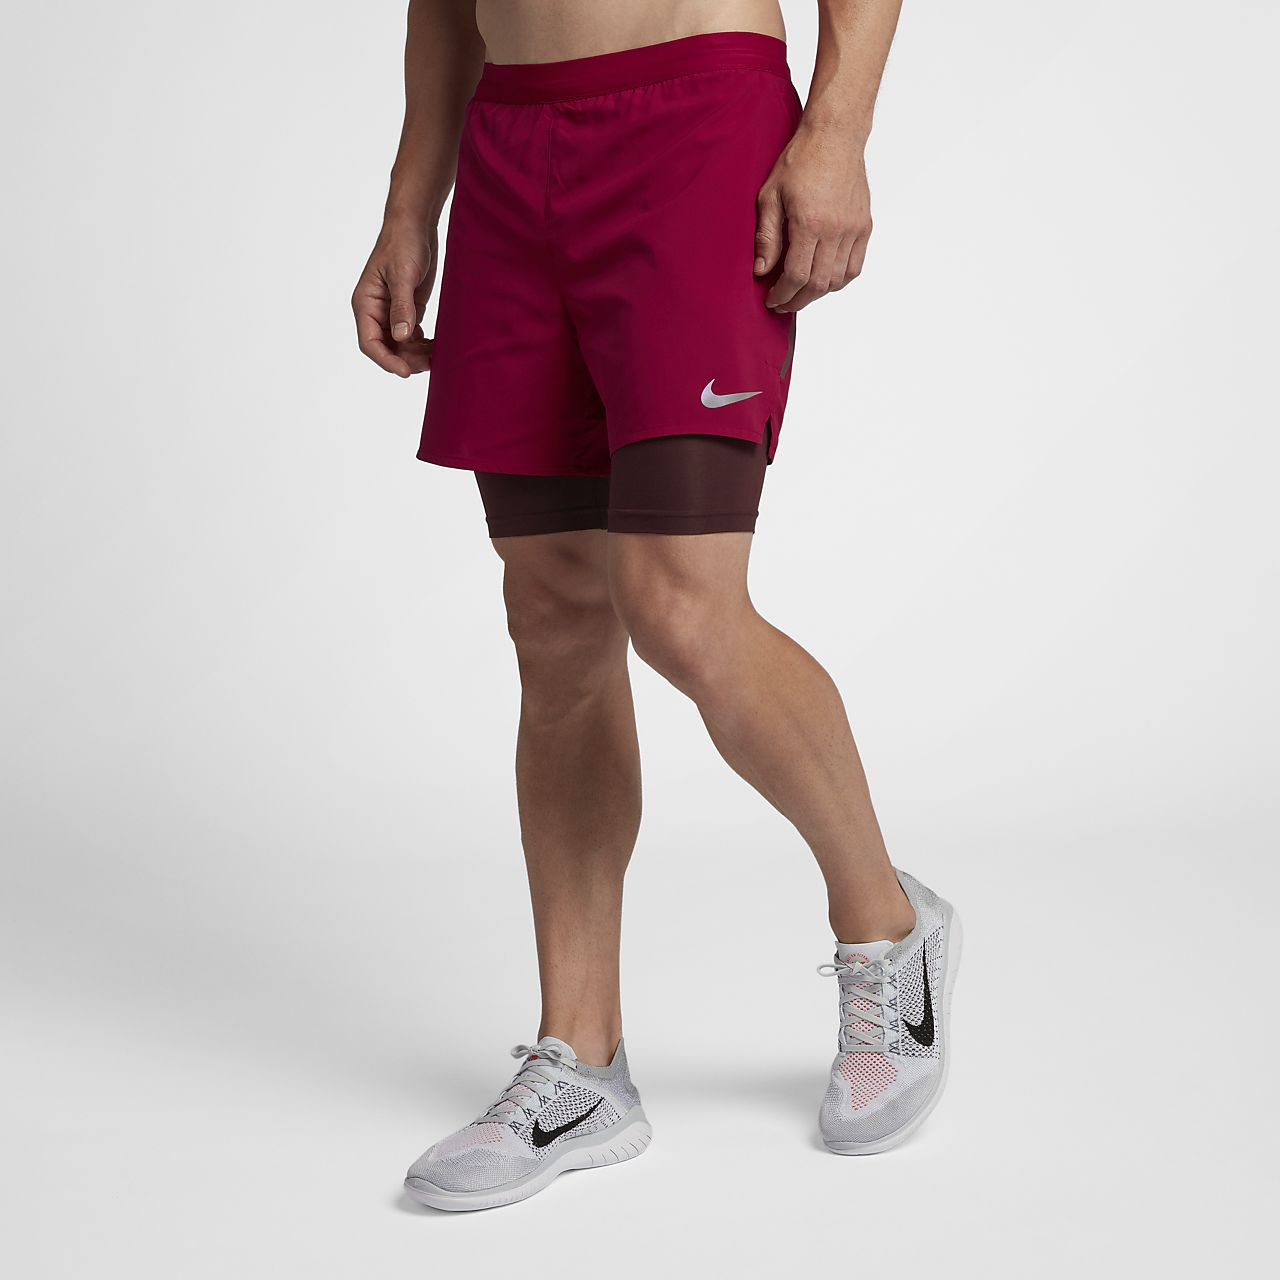 948e247169fd Nike Flex Stride 2-in-1 Men s 5